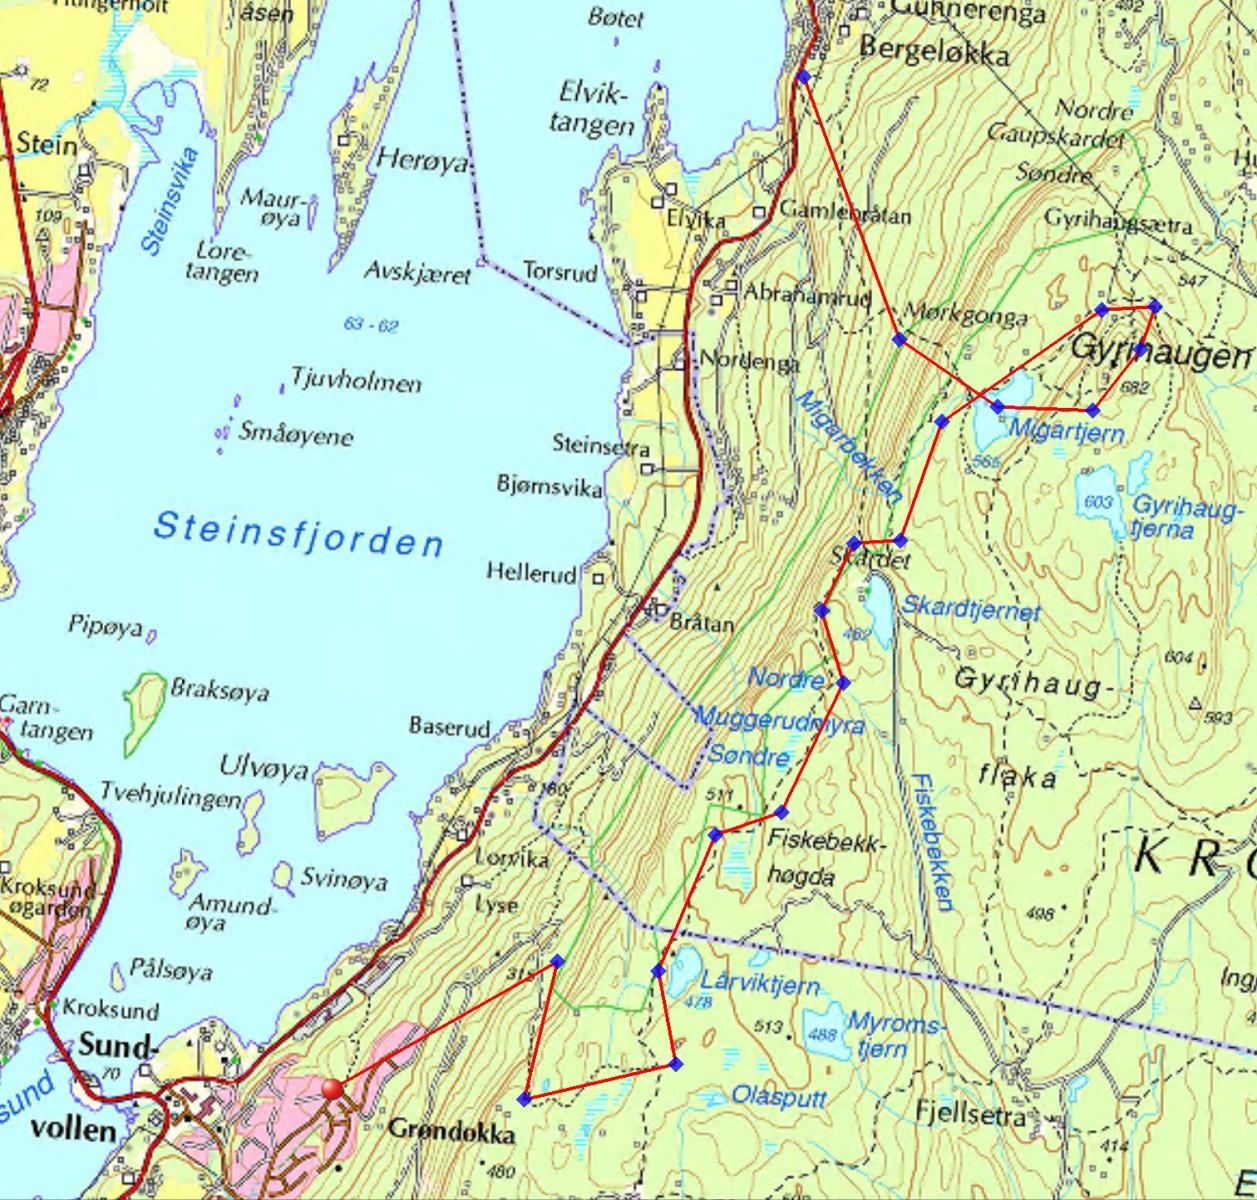 mørkgonga kart Mørkgonga Krokskogens spektakulære ravine   Turrapporter   Fjellforum mørkgonga kart